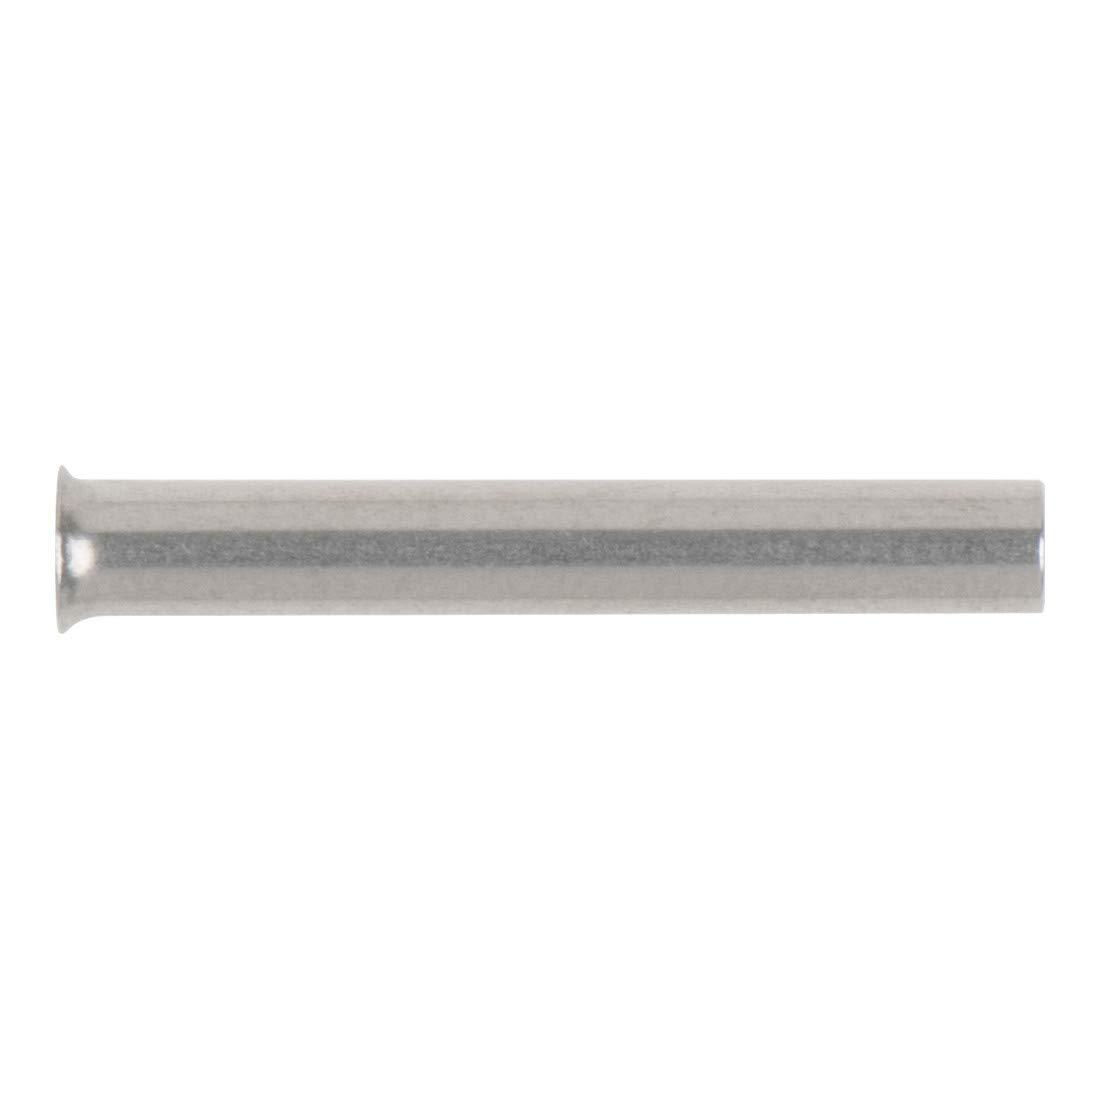 Clear KOSTAL LKS SK Hand Tool KS Tools Sleeve /Ø 1.5 mm